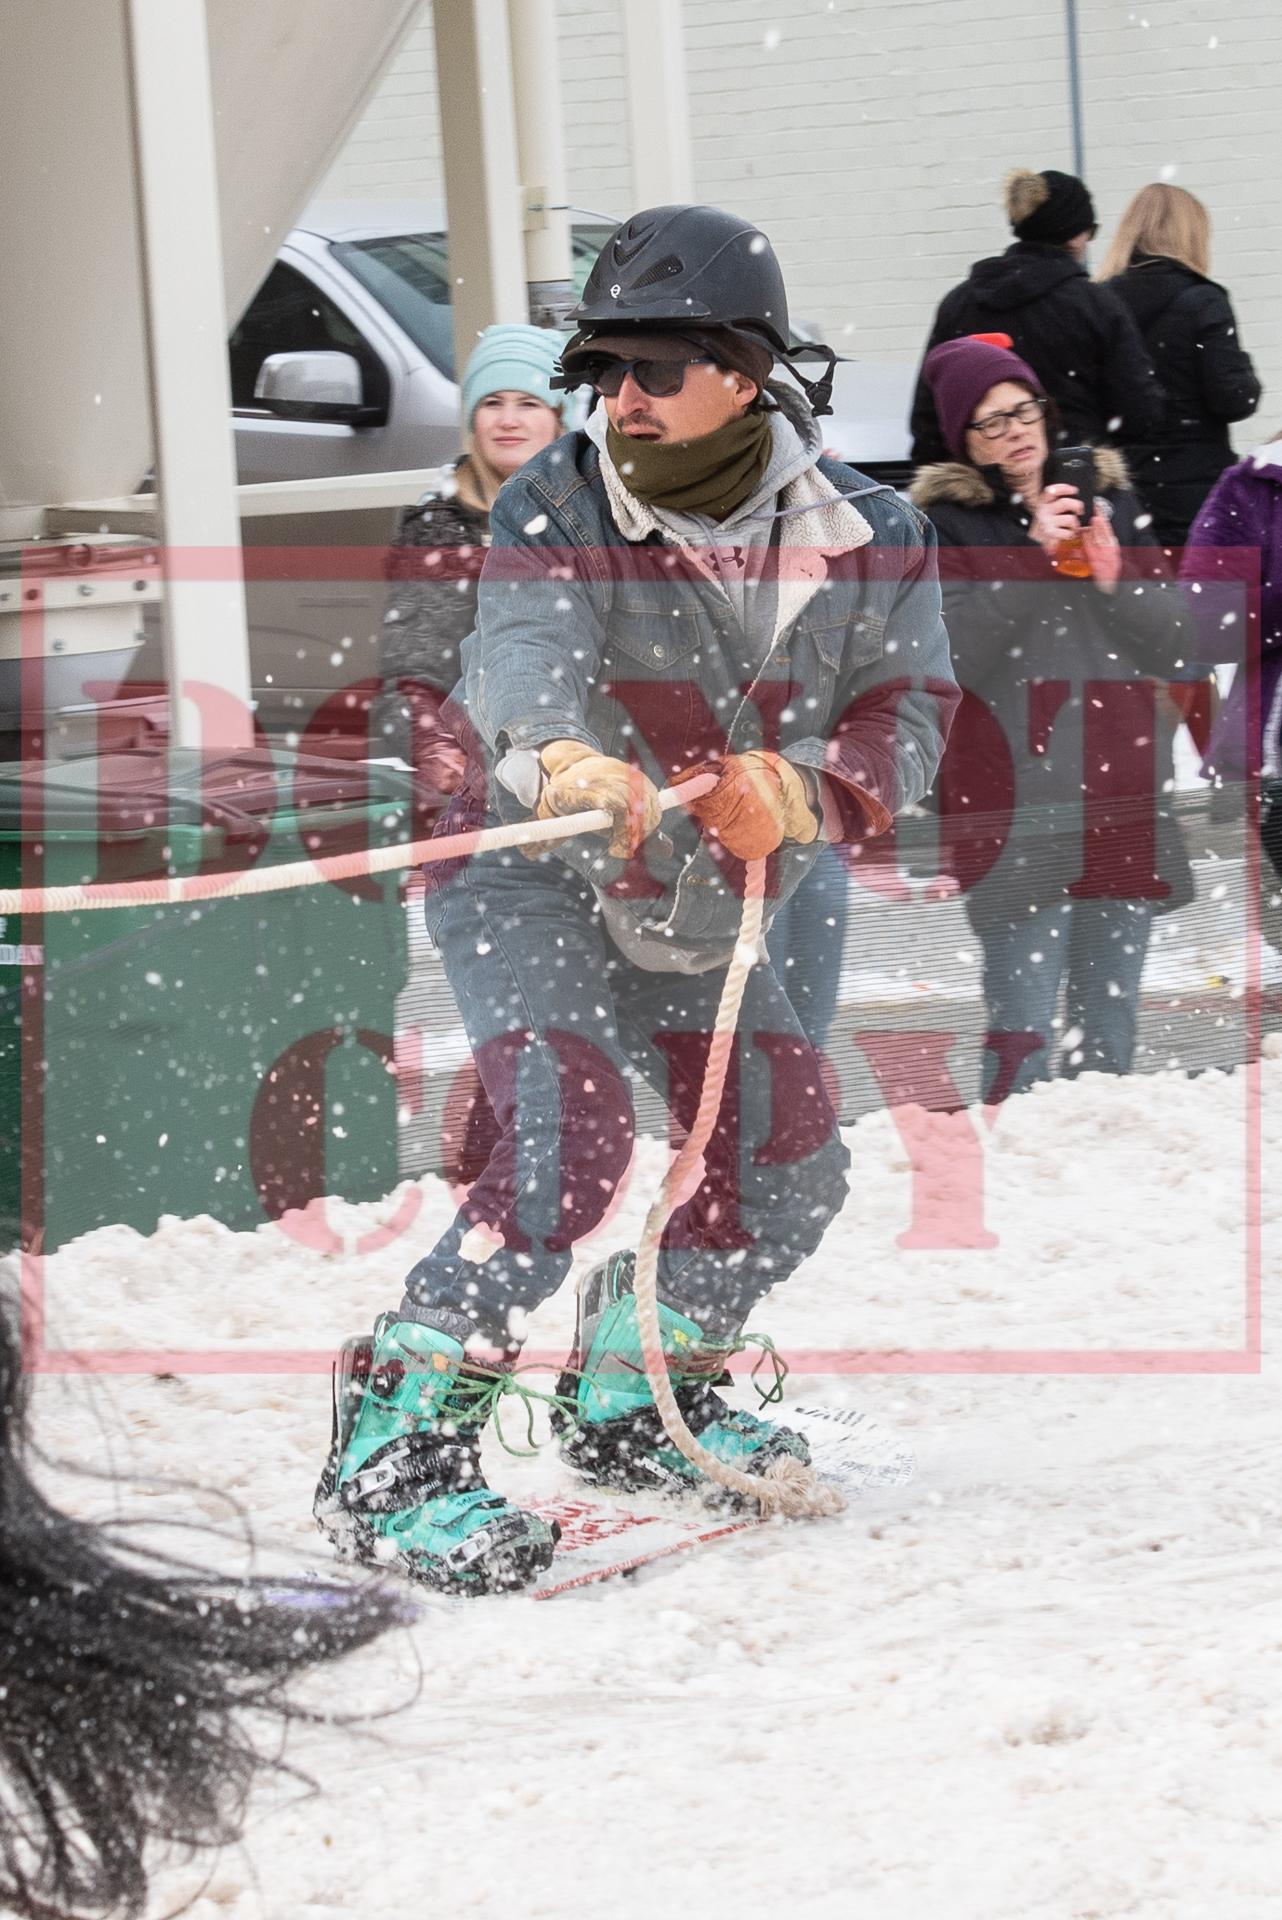 - Chris Poglajen - Snowboard 3